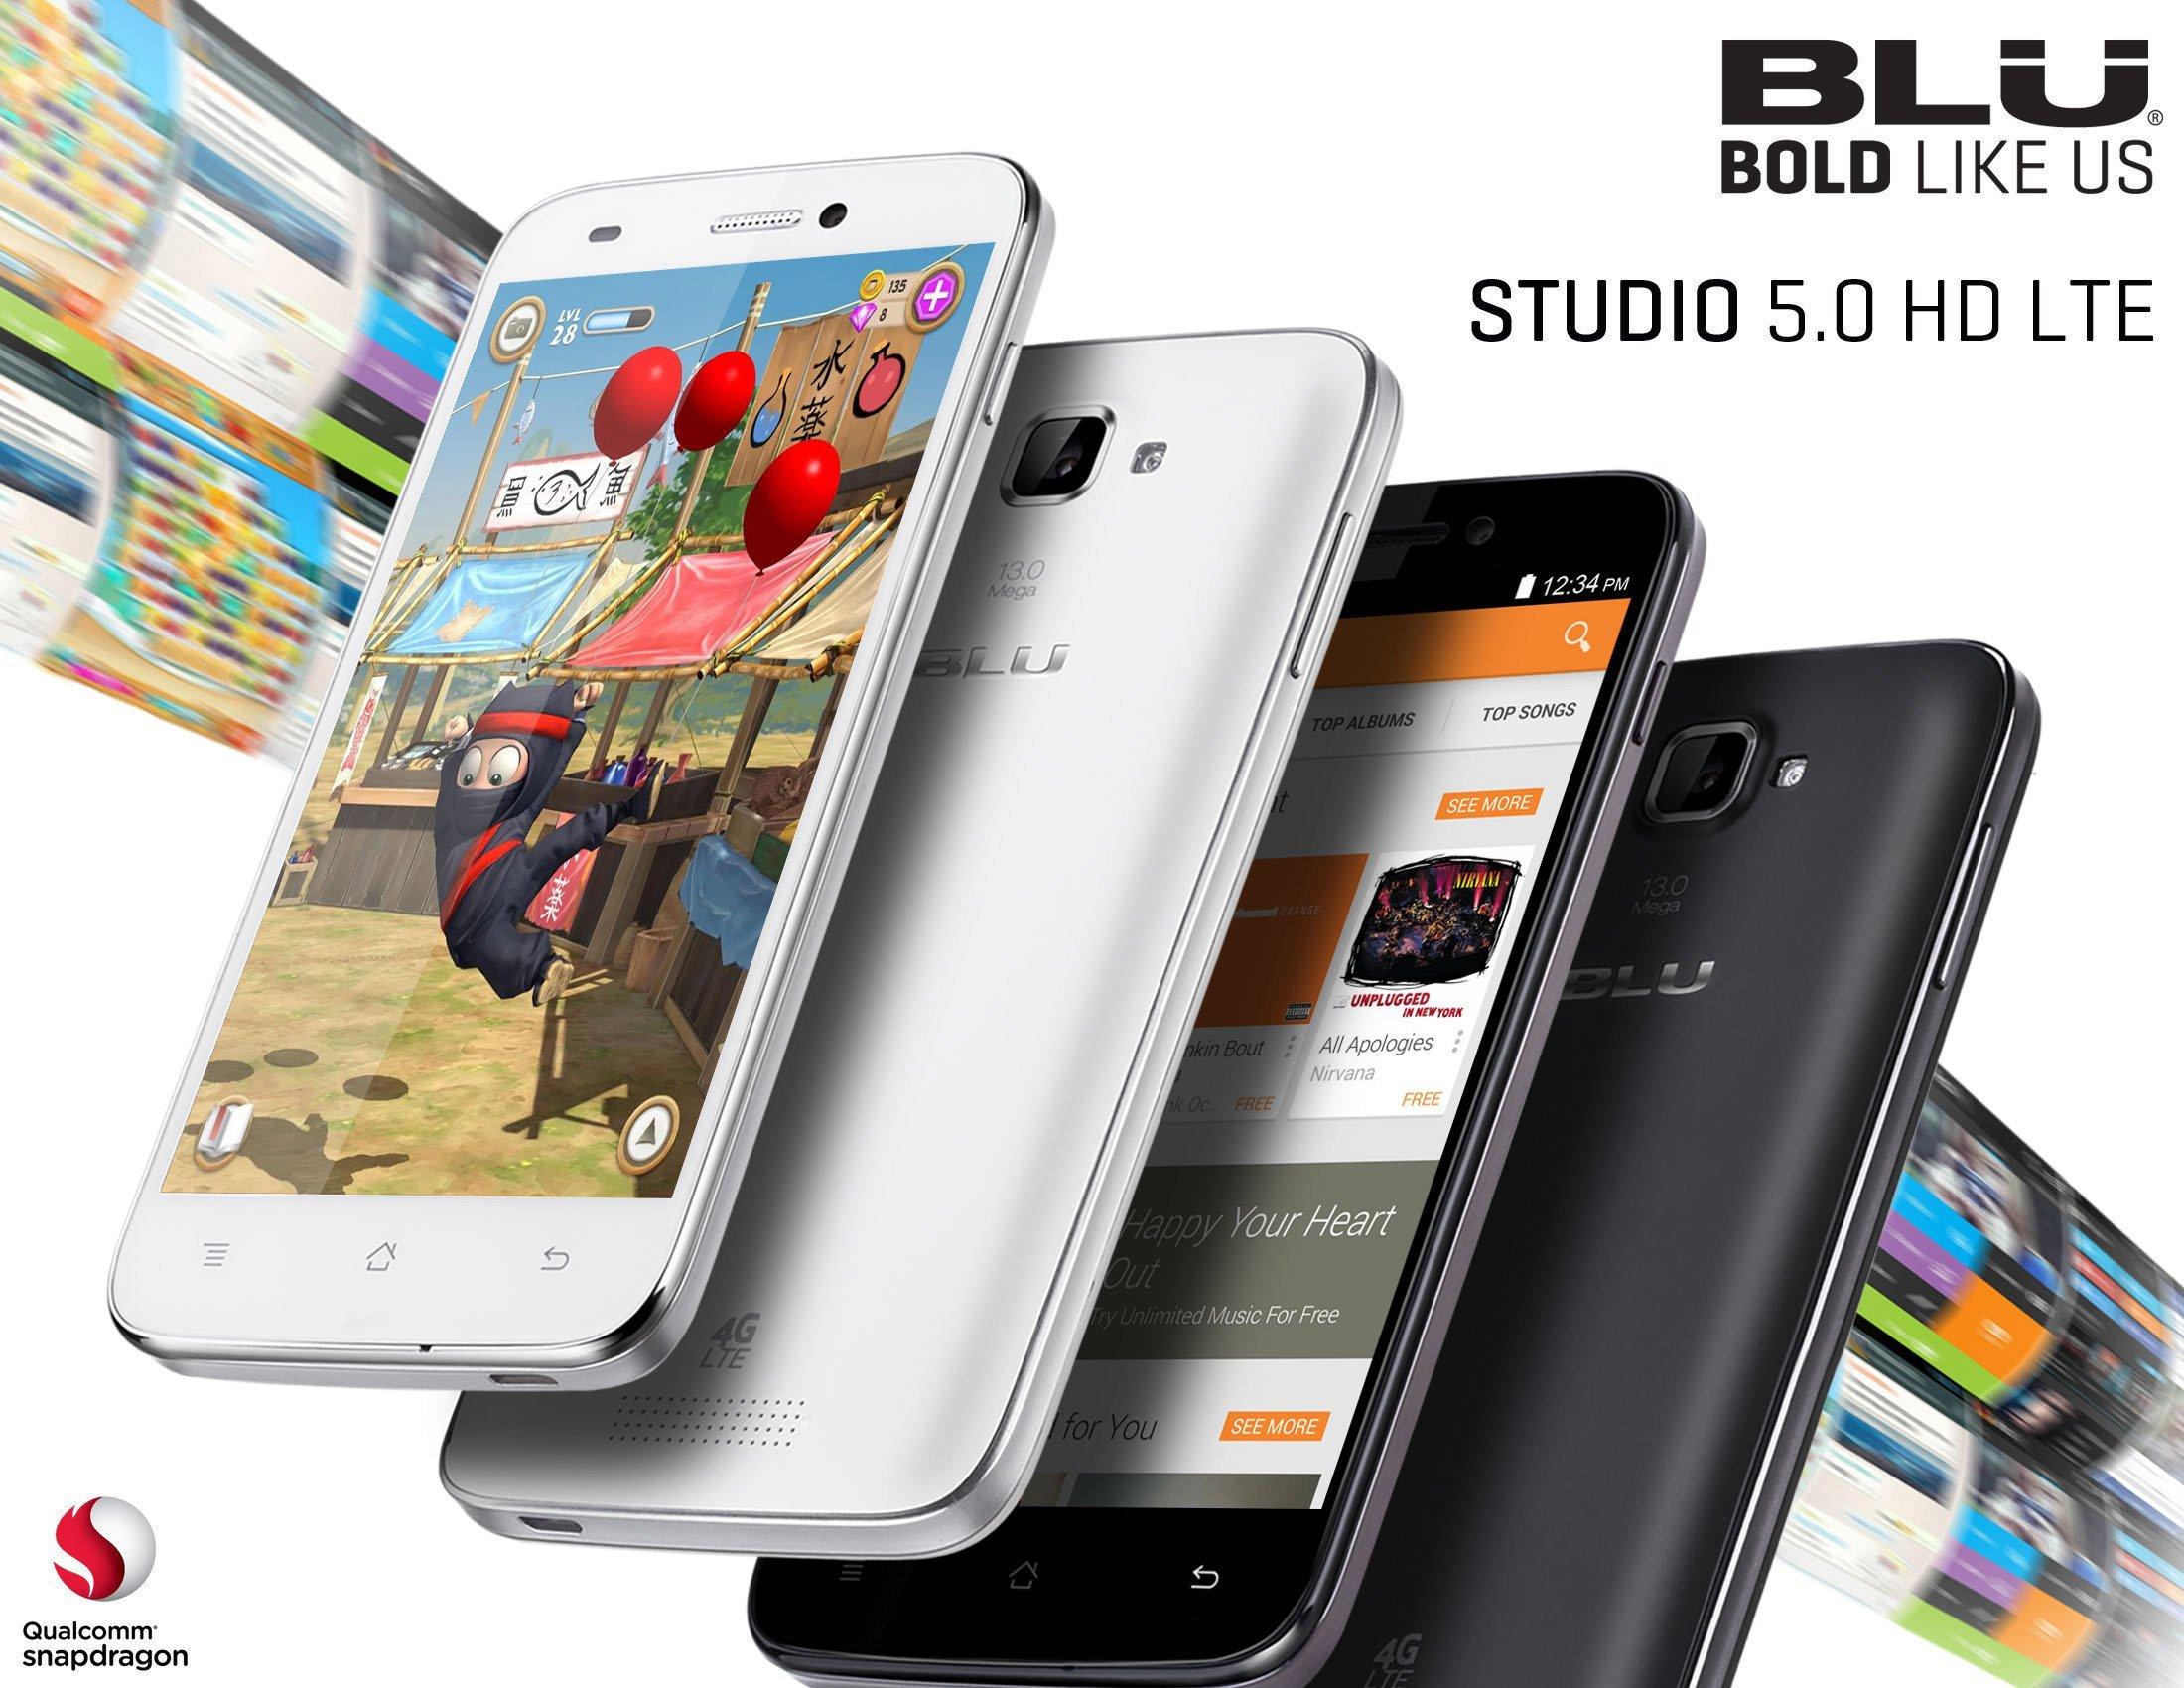 BLU Released Trio Of Studio Smartphones With LTE